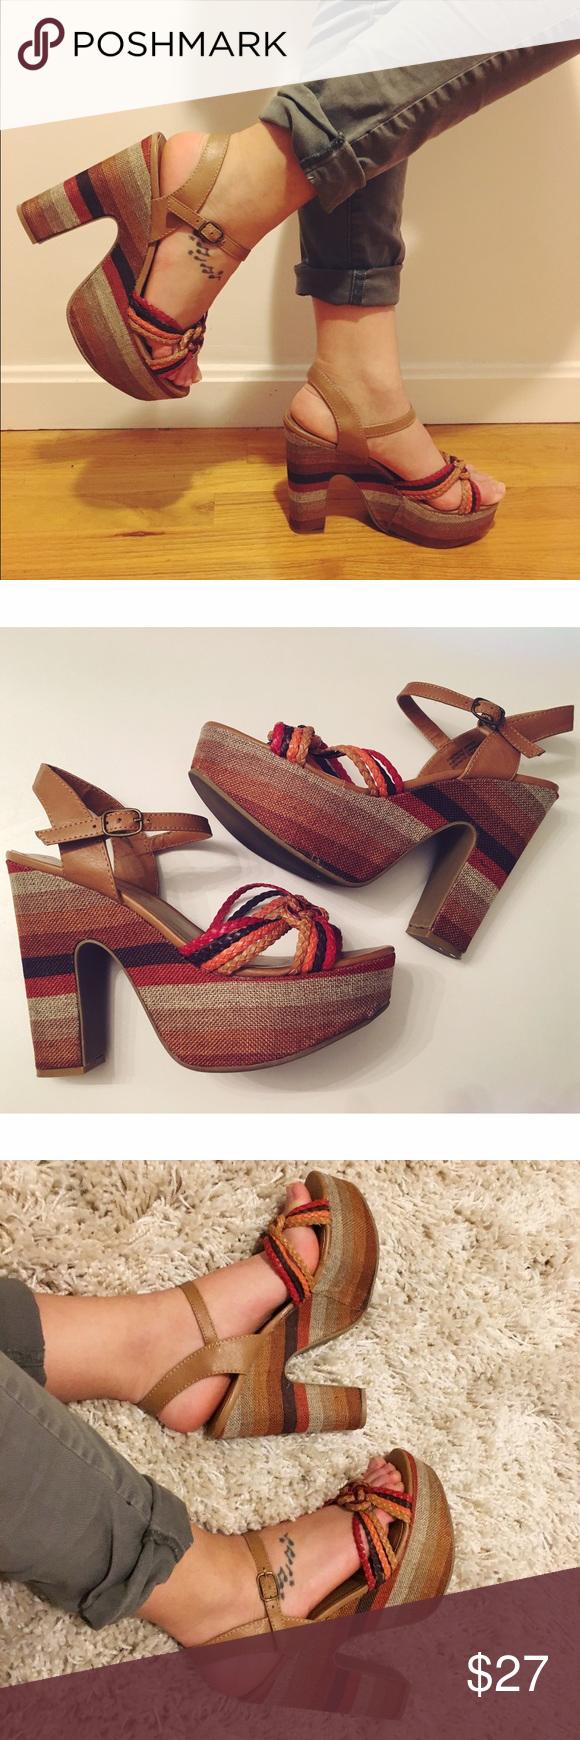 Chunky heels sandals